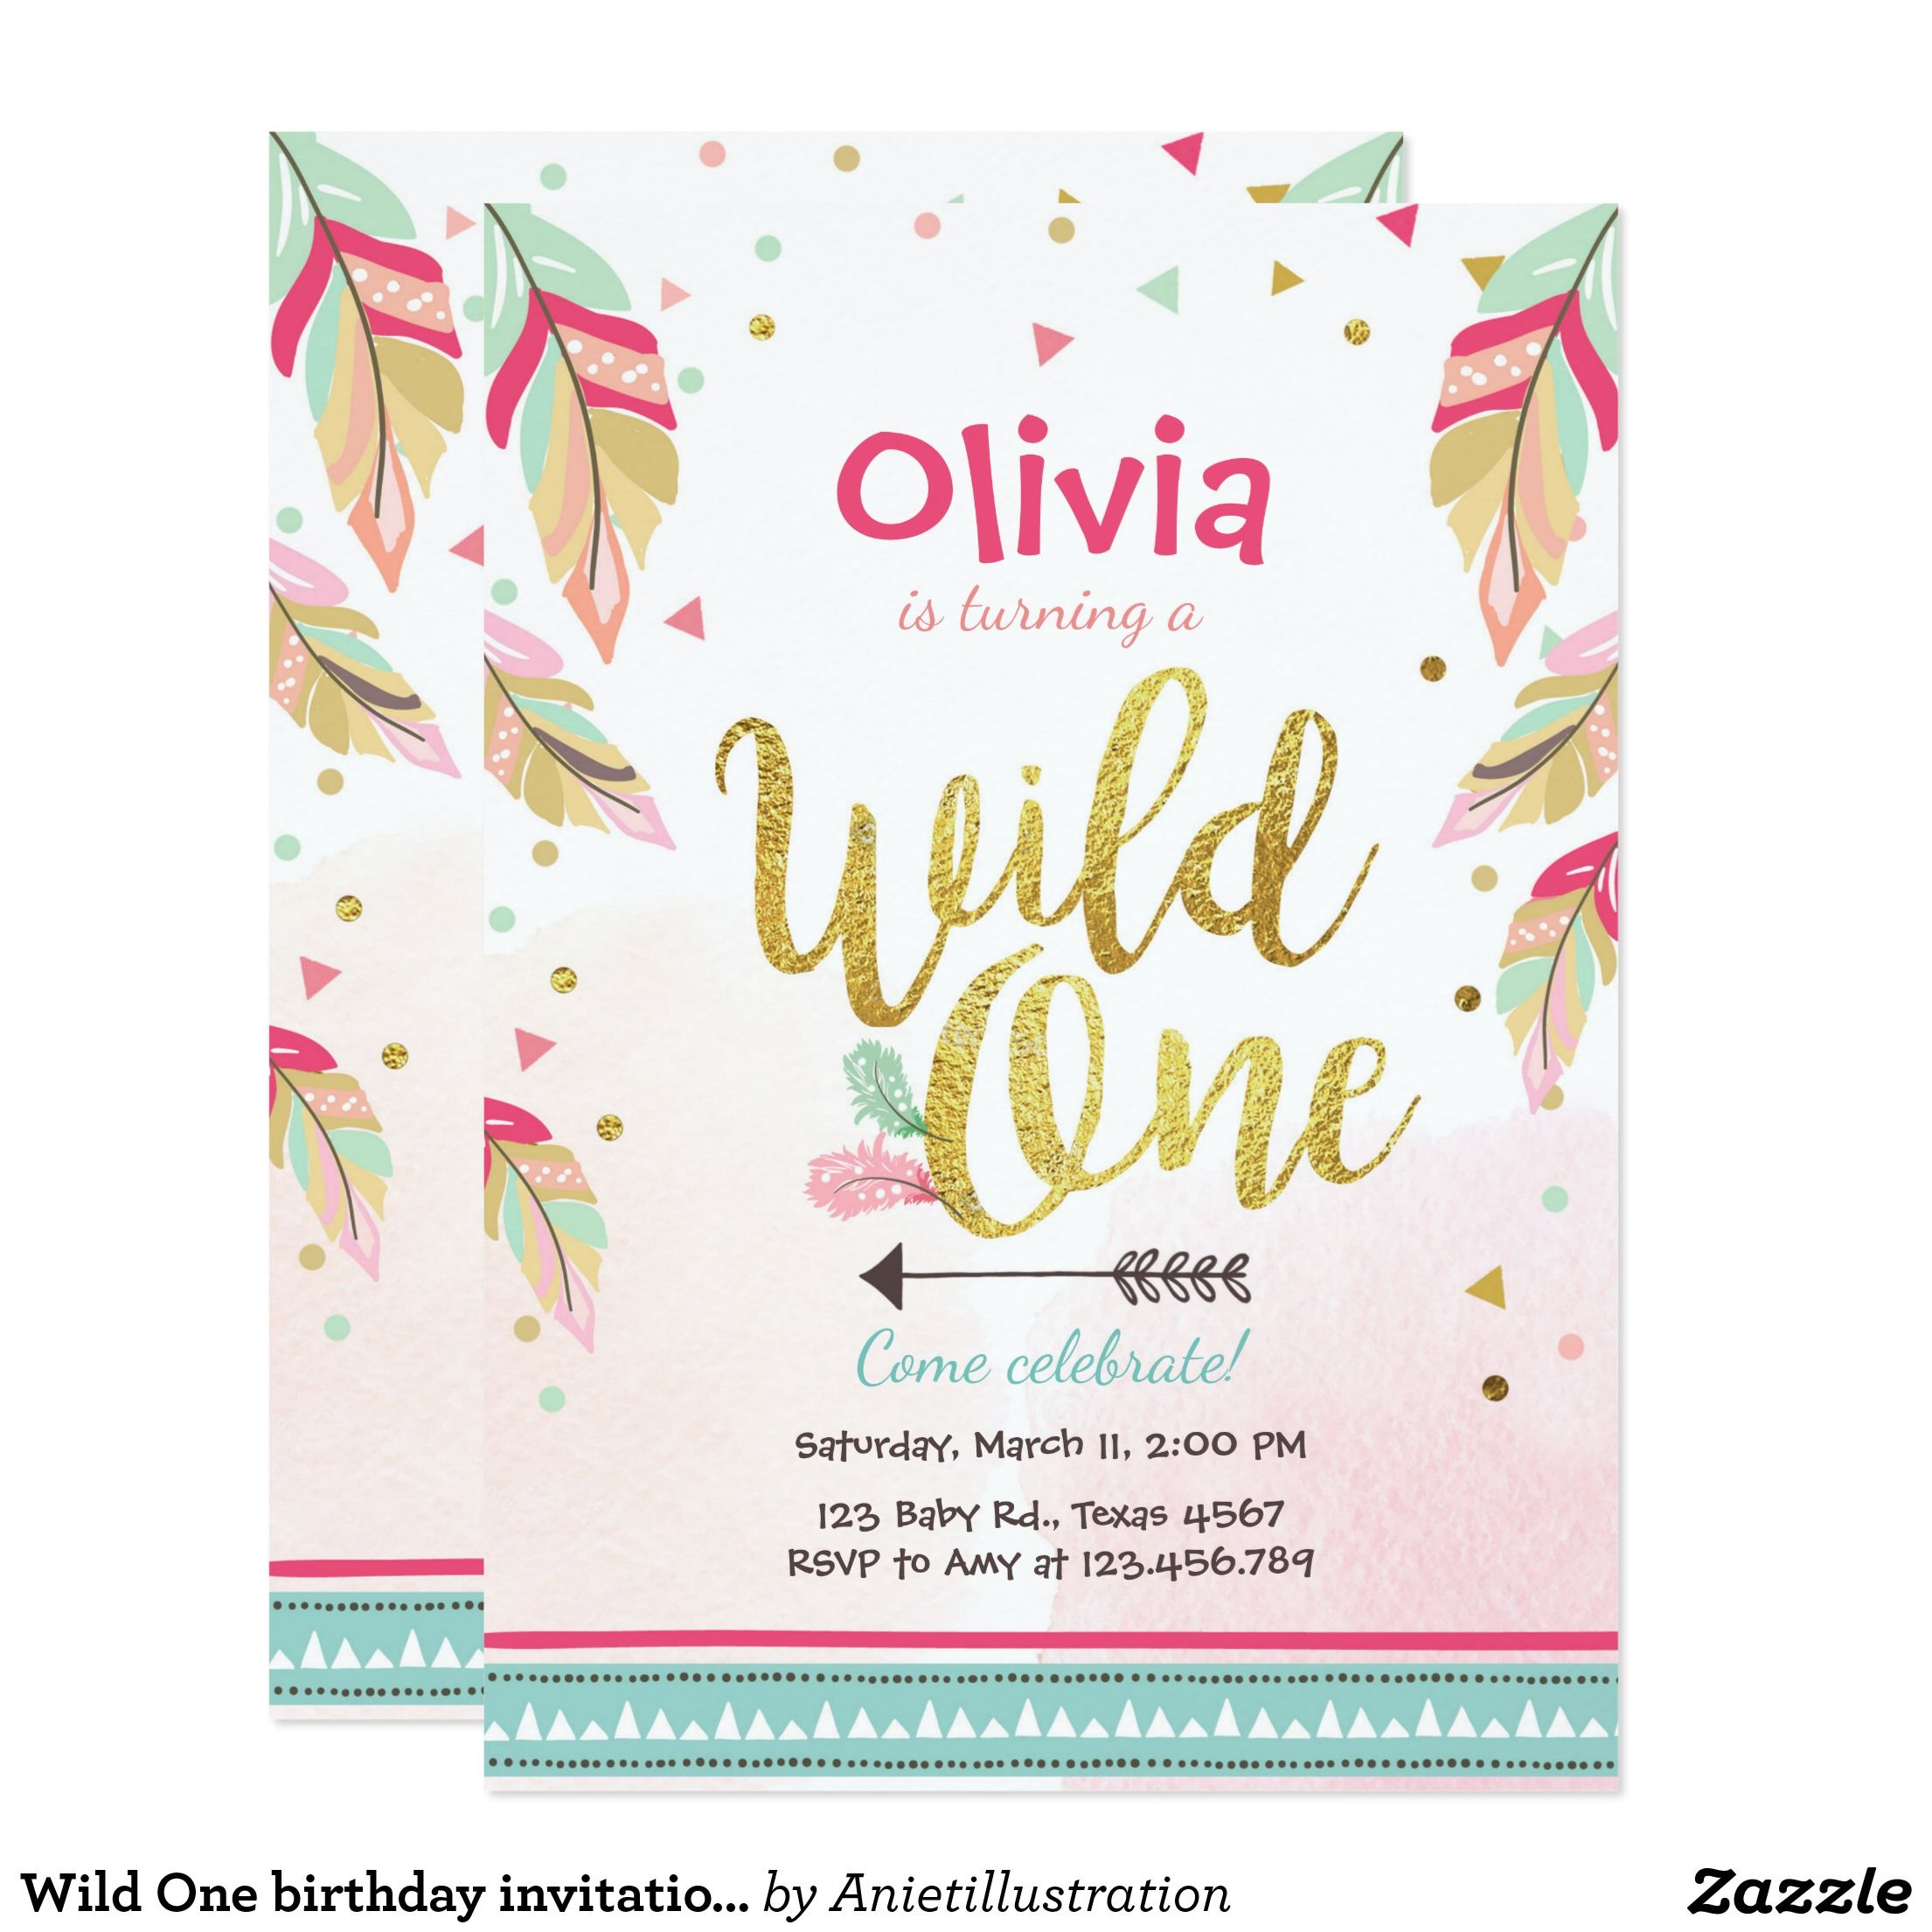 Wild One birthday invitation First birthday Girl | Birthdays and ...